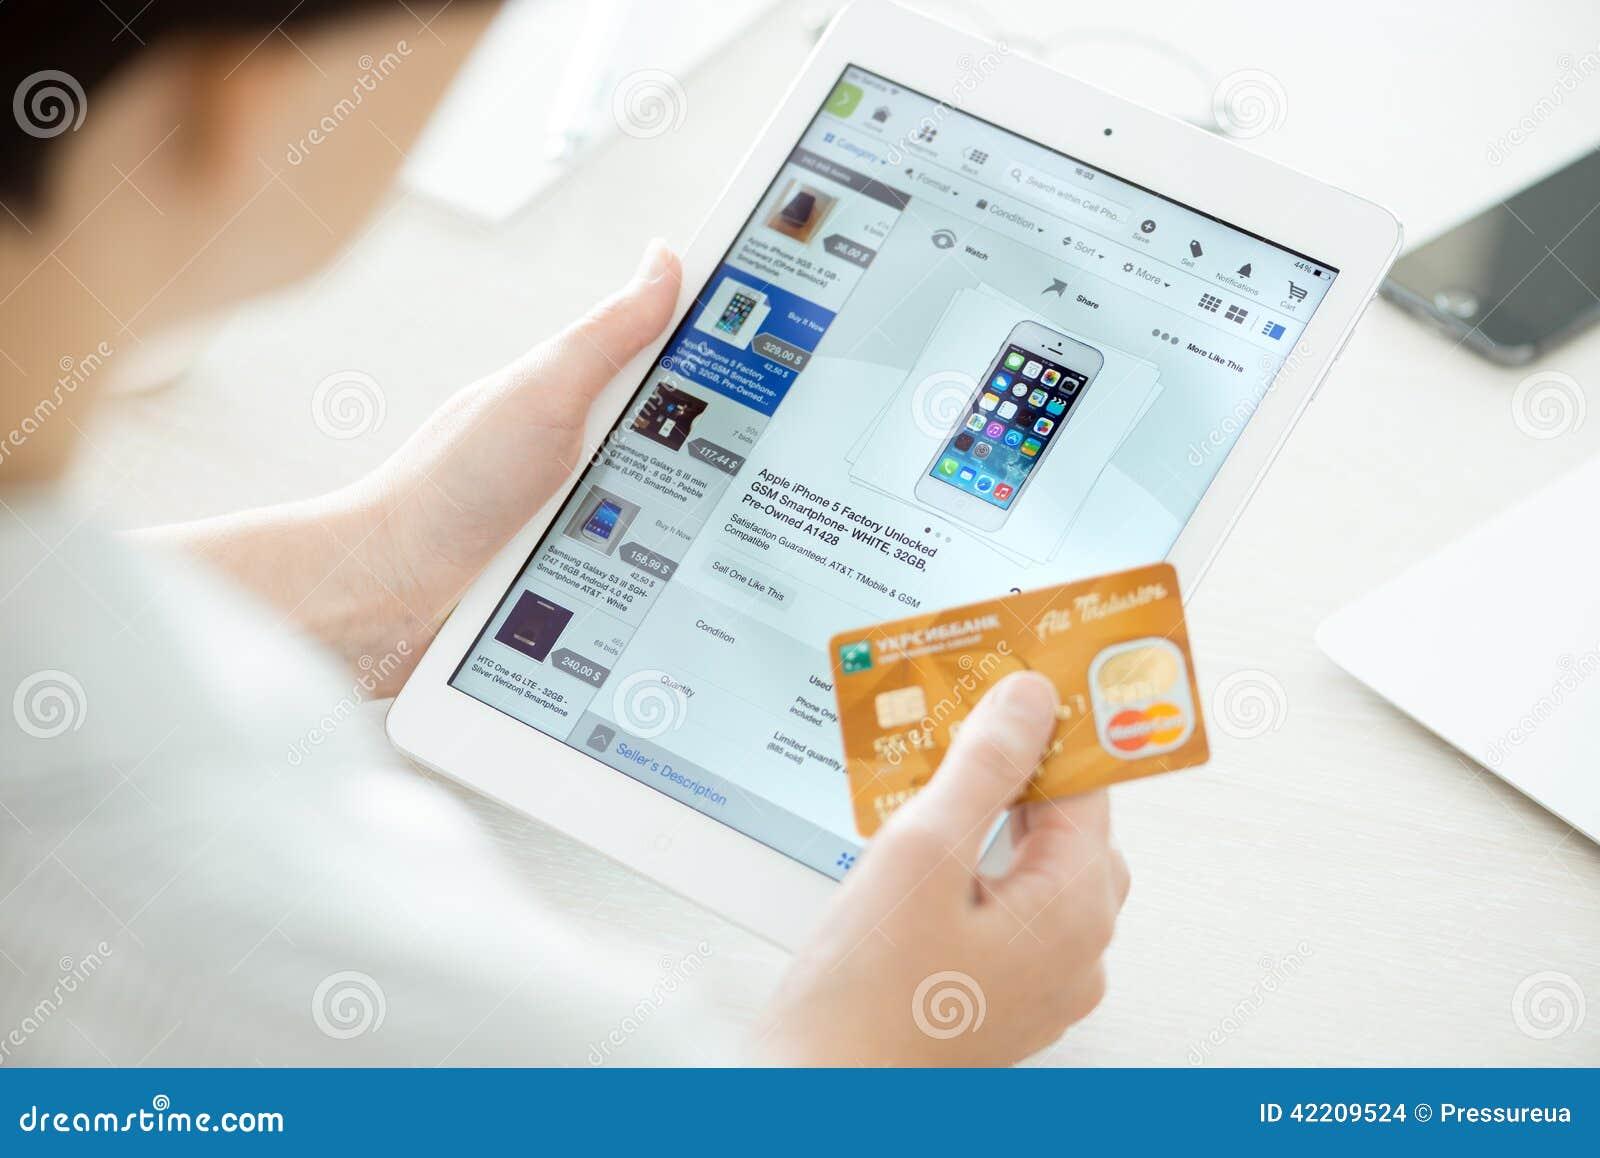 apple ipad credit